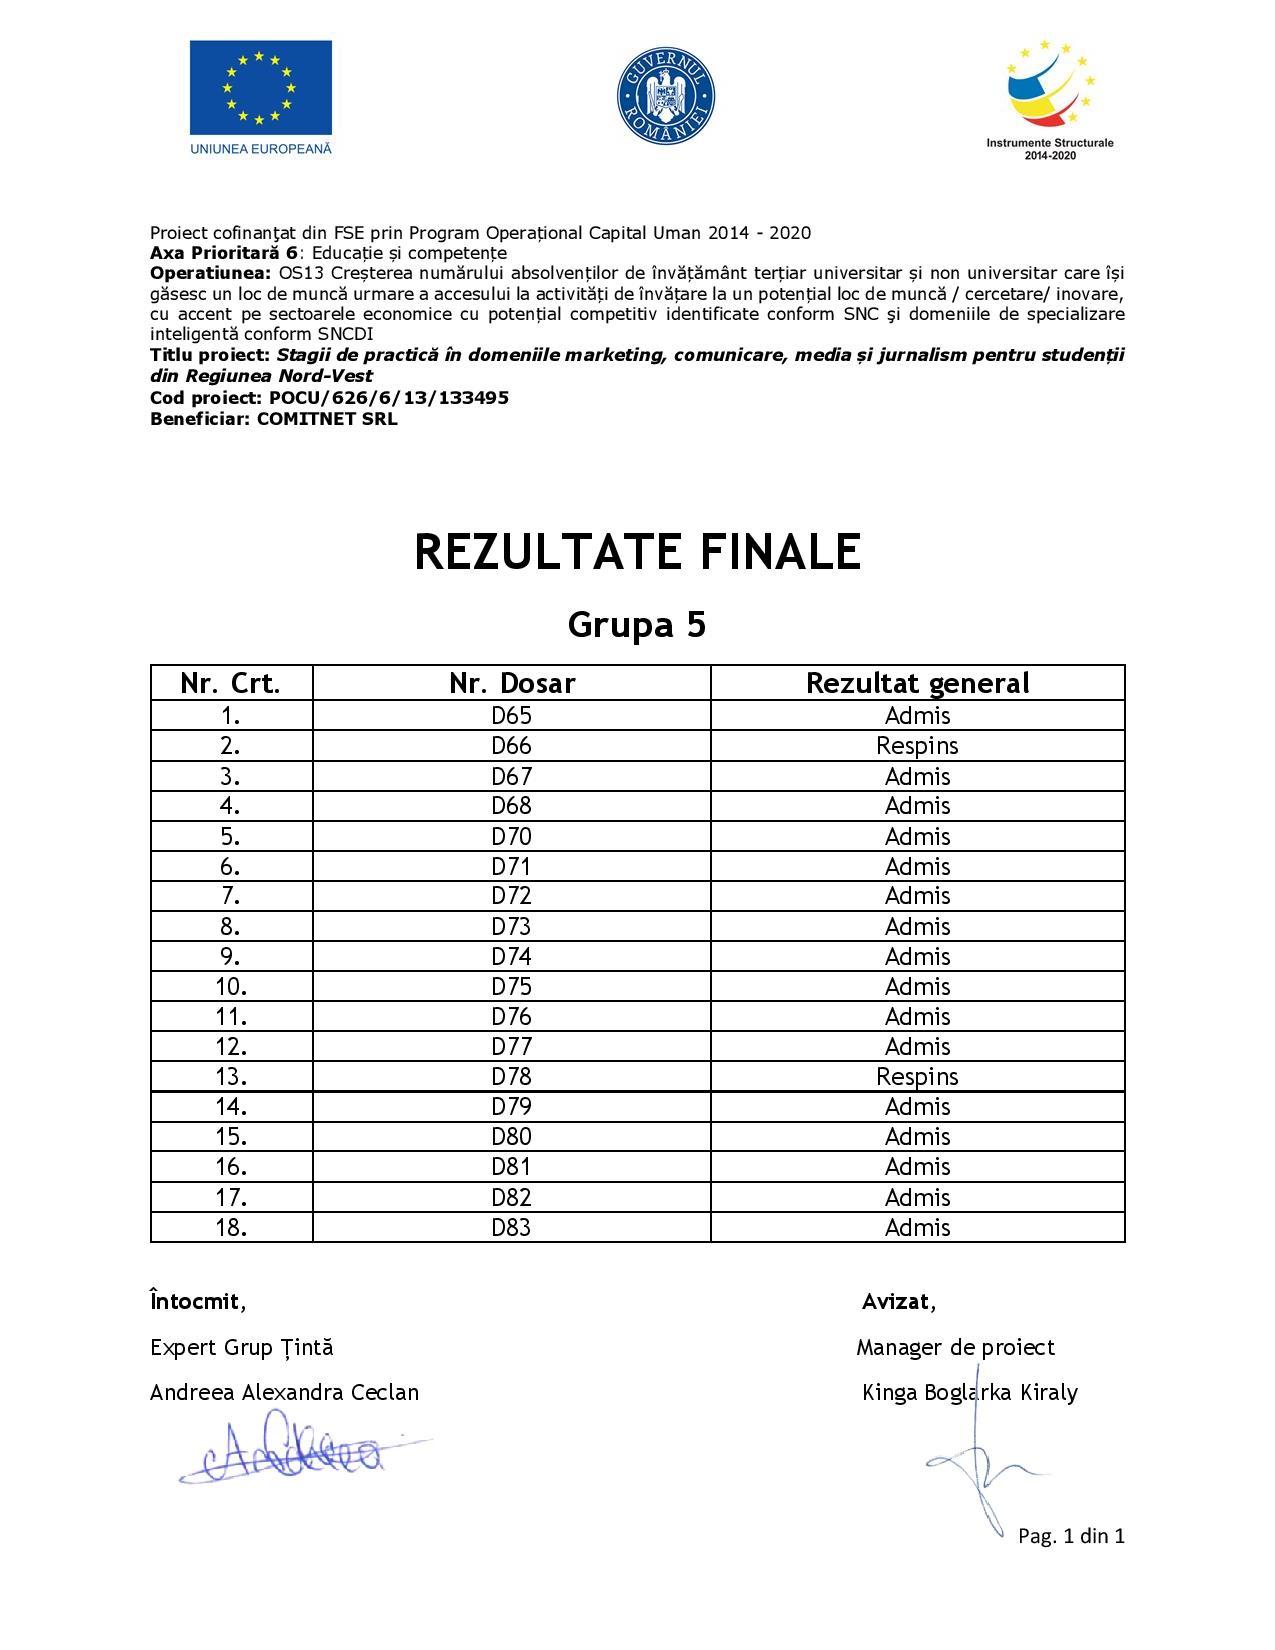 [Stagii de Practică SEO 365] Rezultate finale - Grupa V-page-001